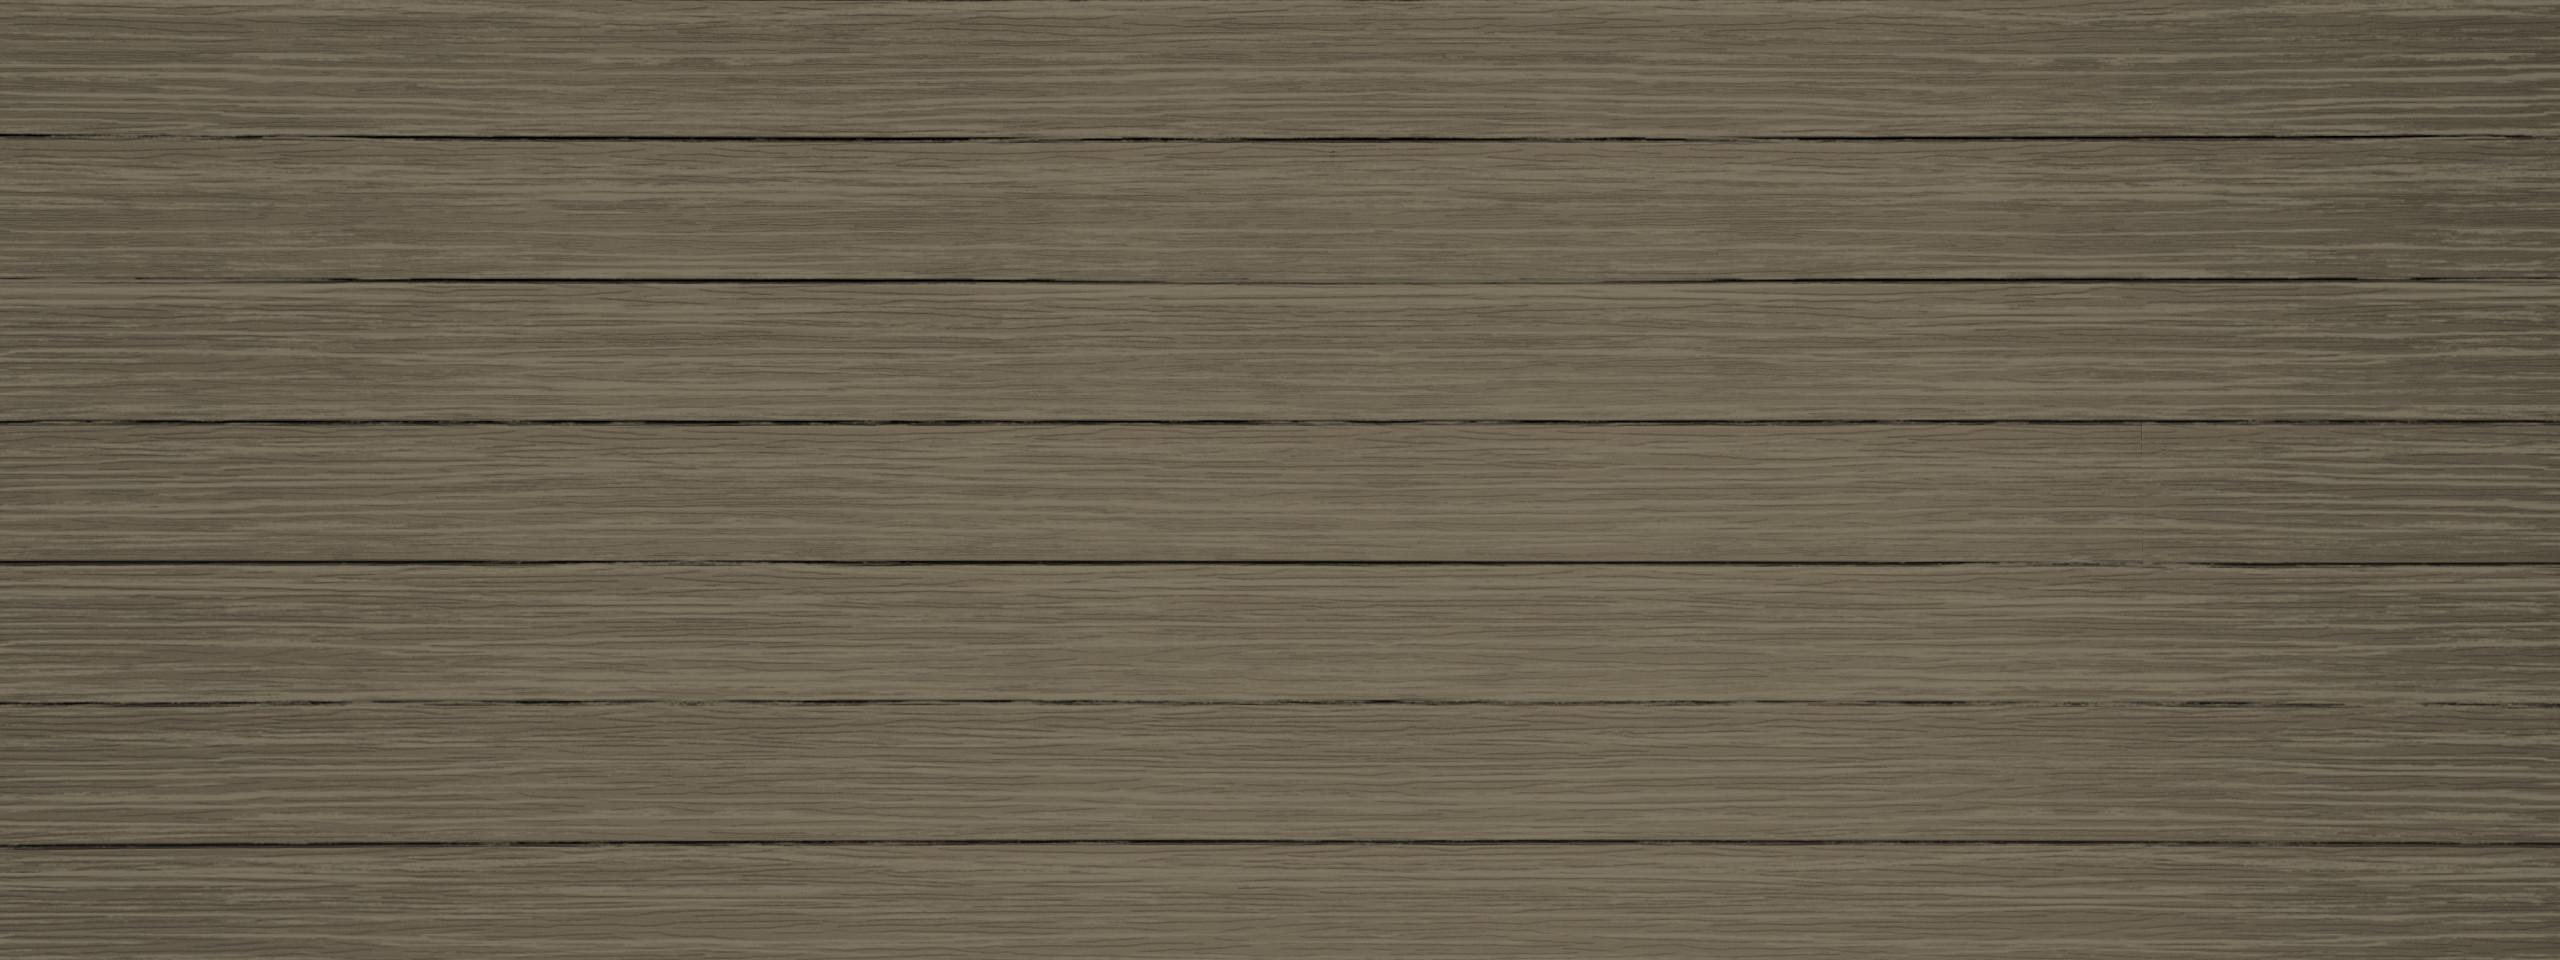 Entex traditional lap canyon hd horizontal steel siding